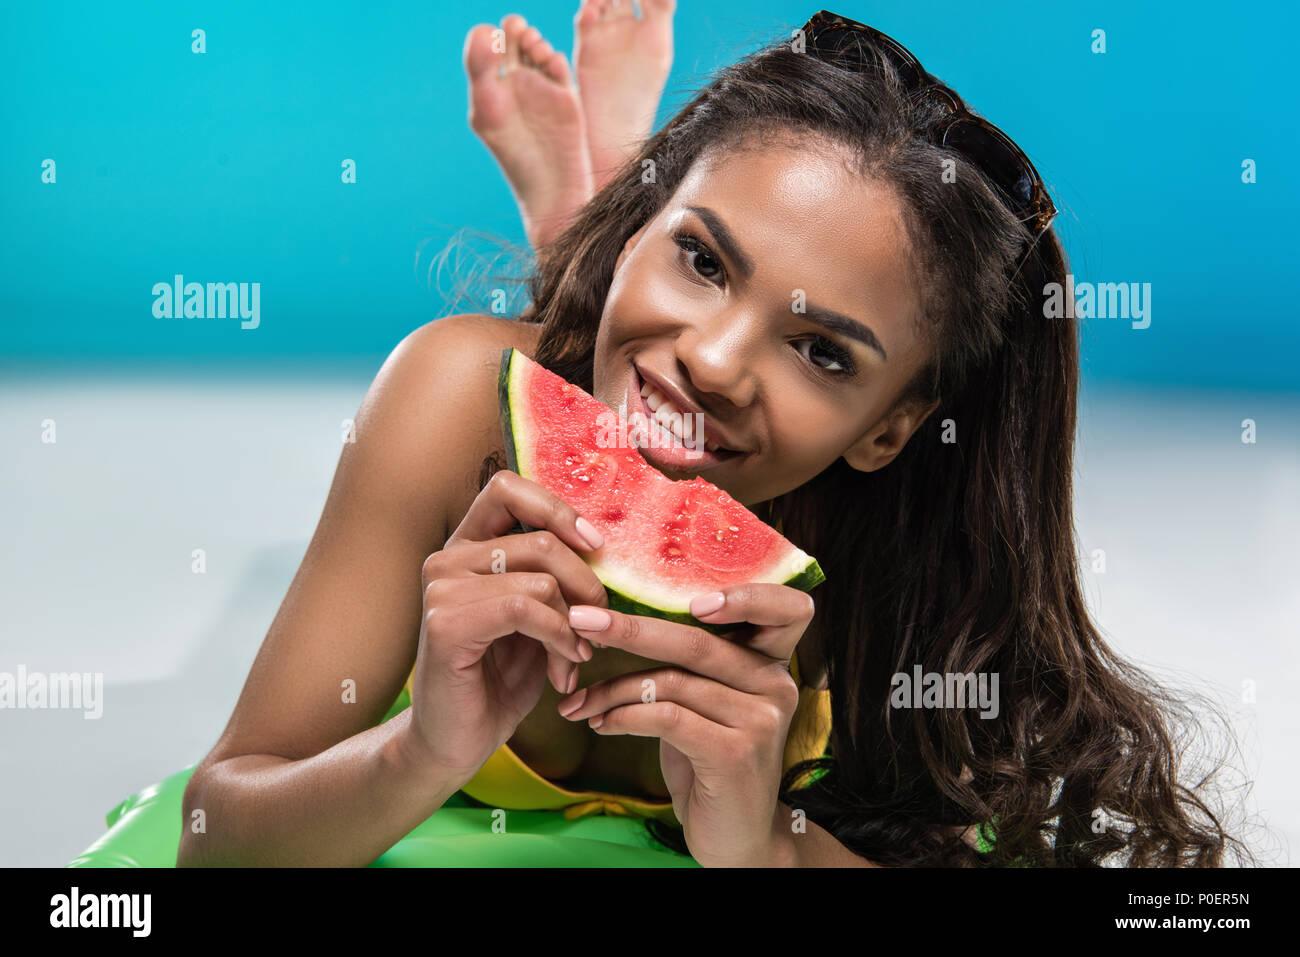 african american girl in swimwear eating watermelon while lying on swimming mattress - Stock Image